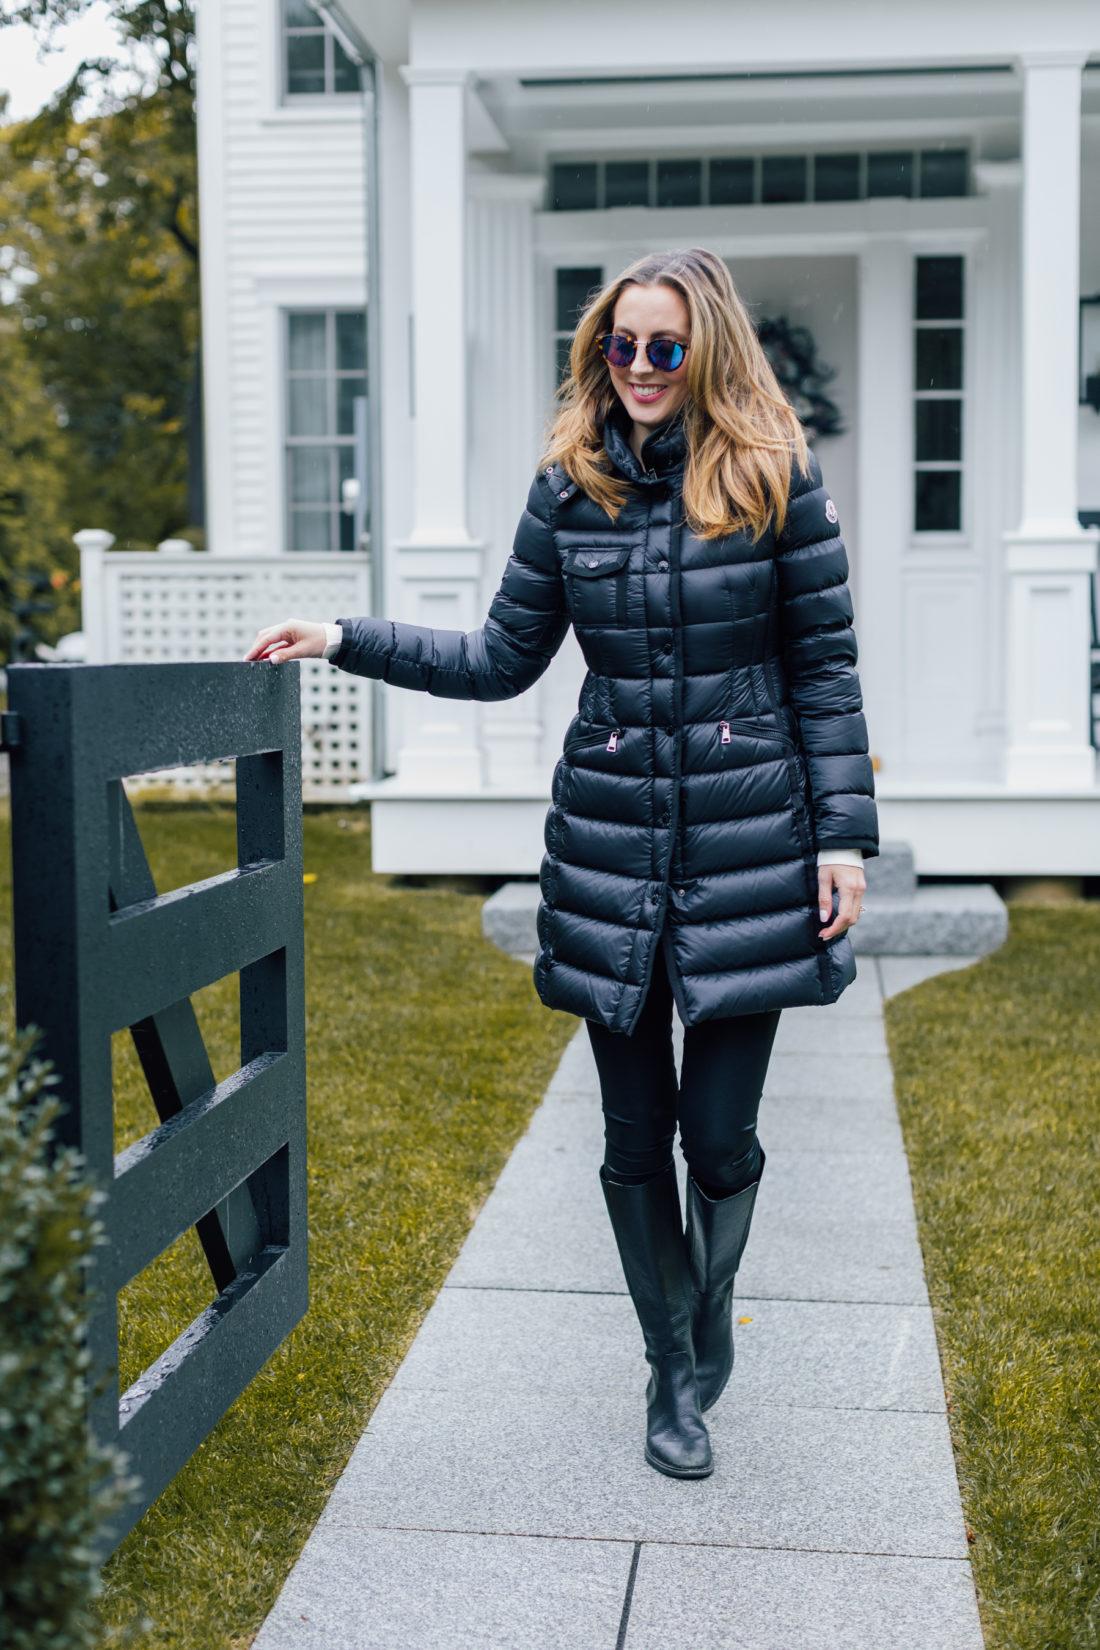 Eva Amurri Martino wears a pricey Moncler winter coat